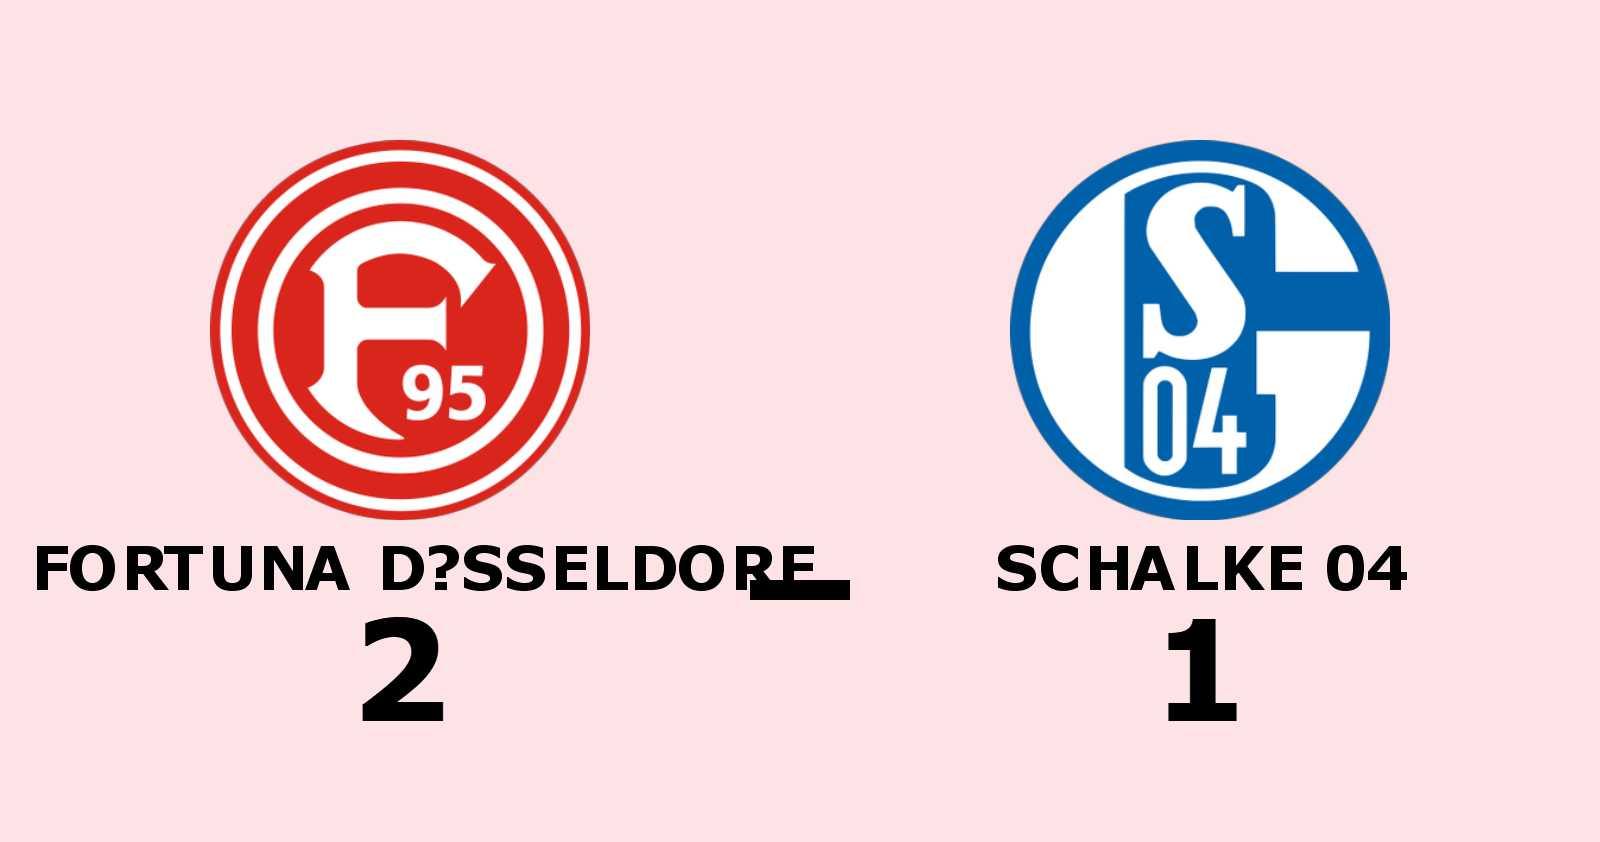 Fortuna Düsseldorf avgjorde i andra halvlek mot Schalke 04